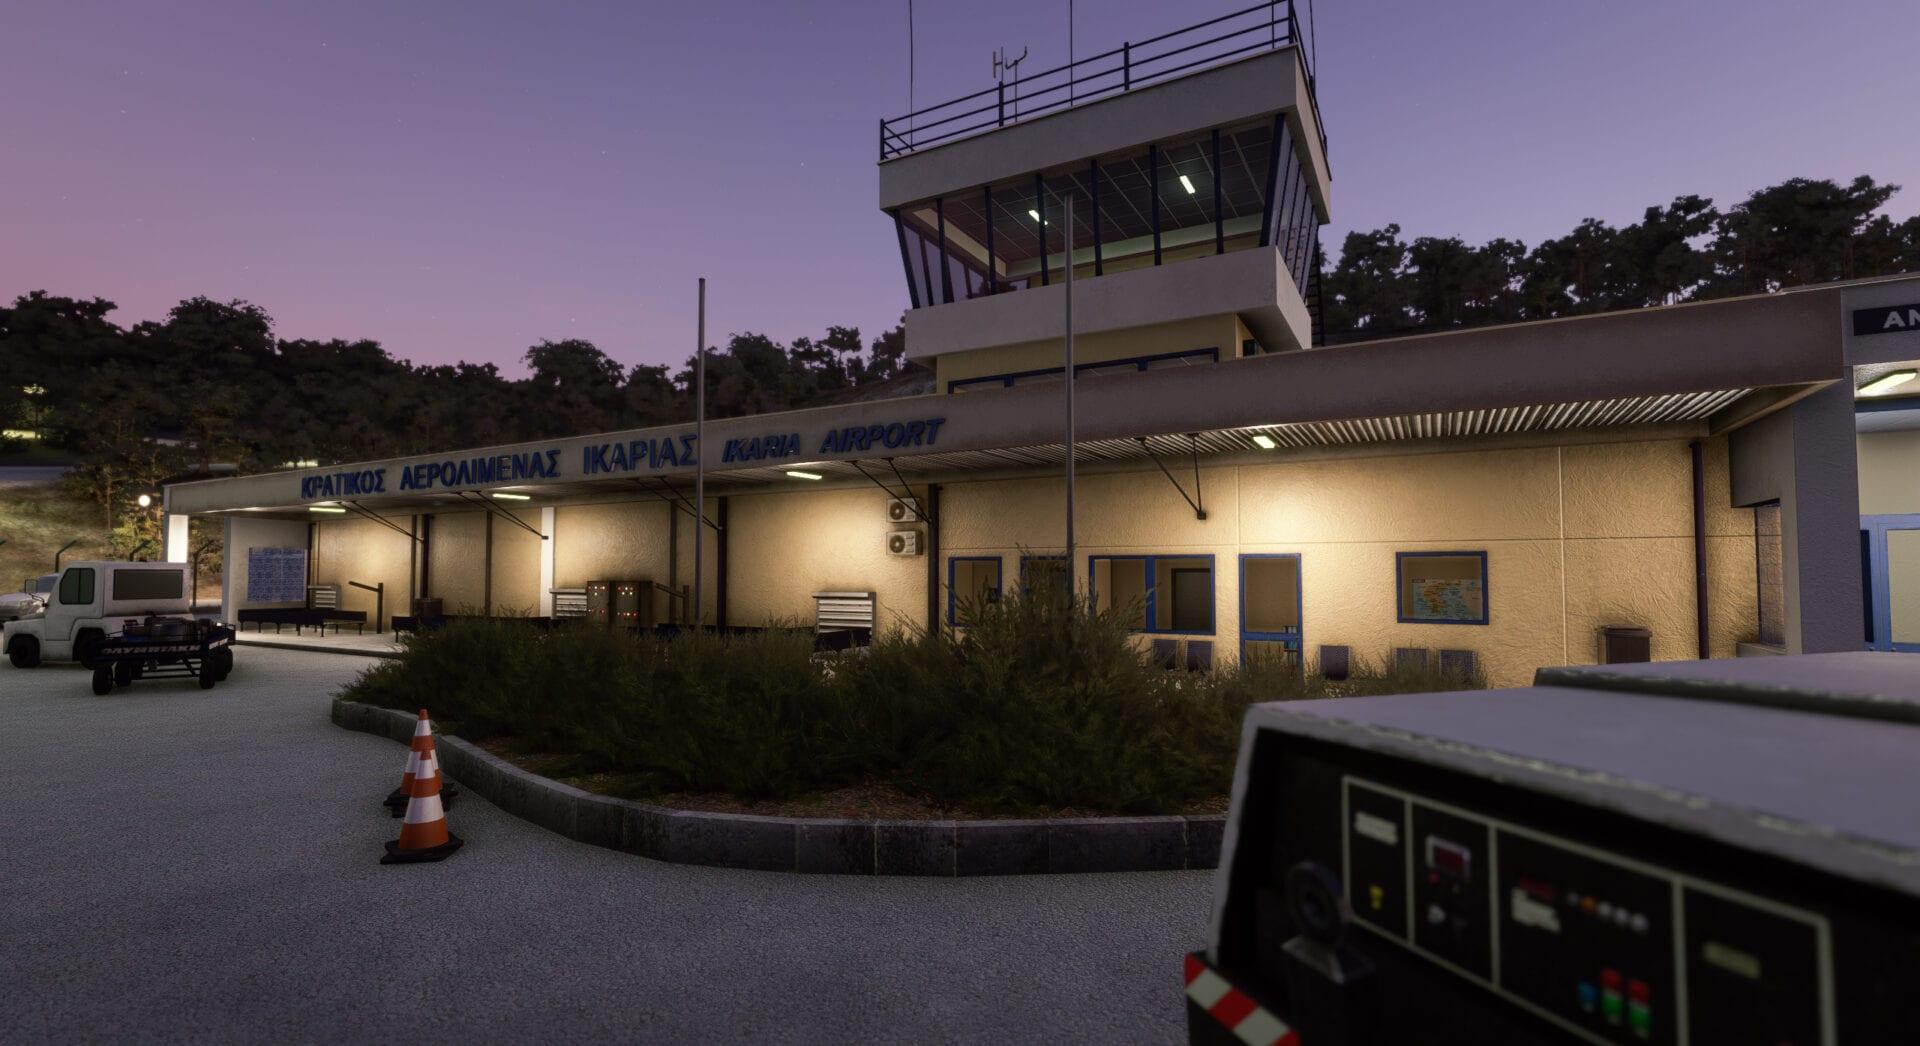 Microsoft-Flight-Simulator-Ikaria-5-scaled.jpg?ssl=1